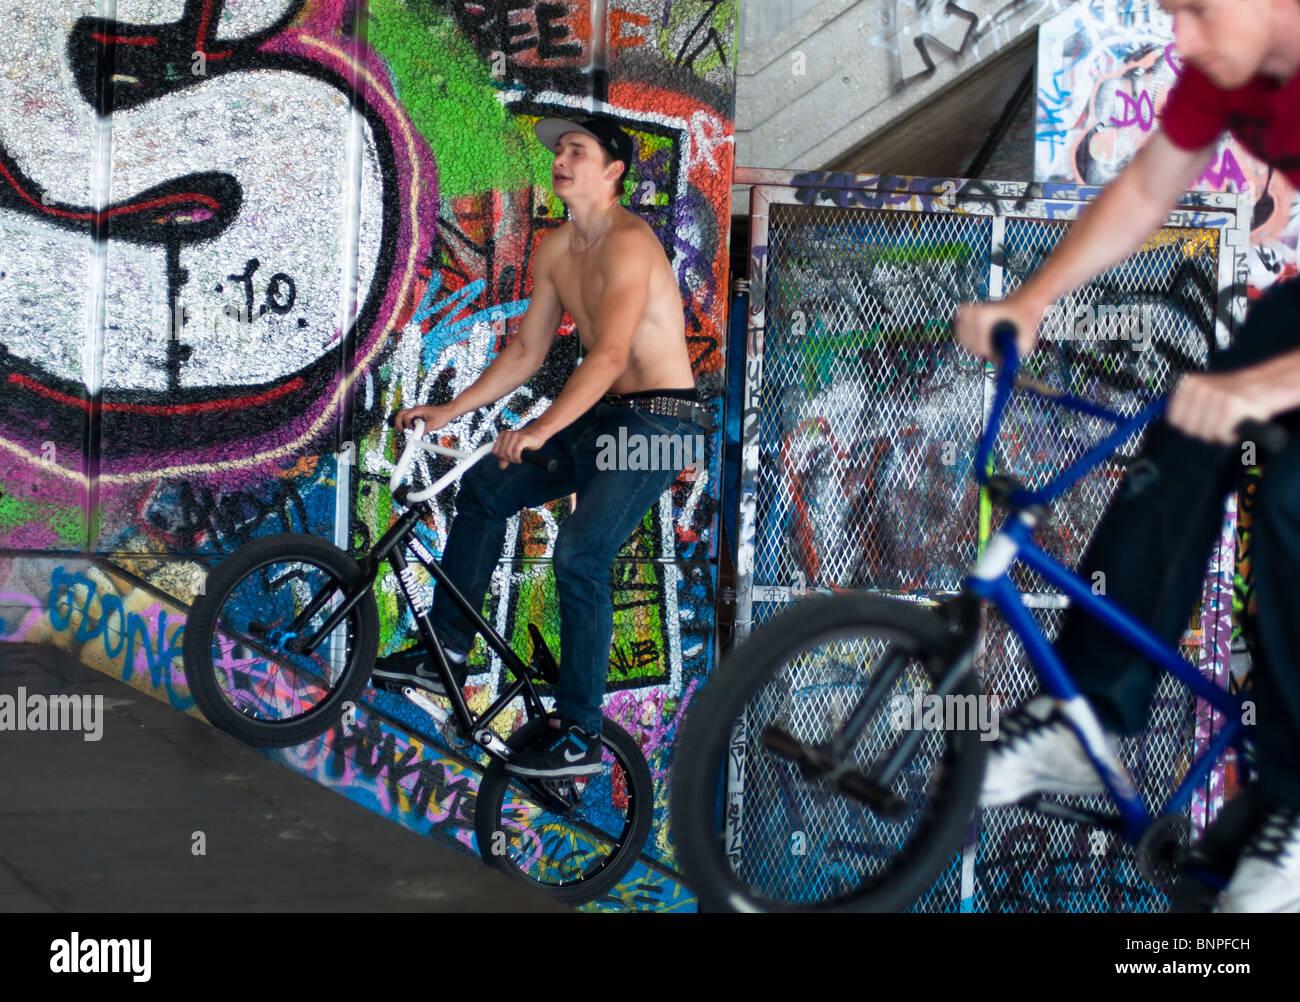 Stunt bikers at Southbank, London, England - Stock Image